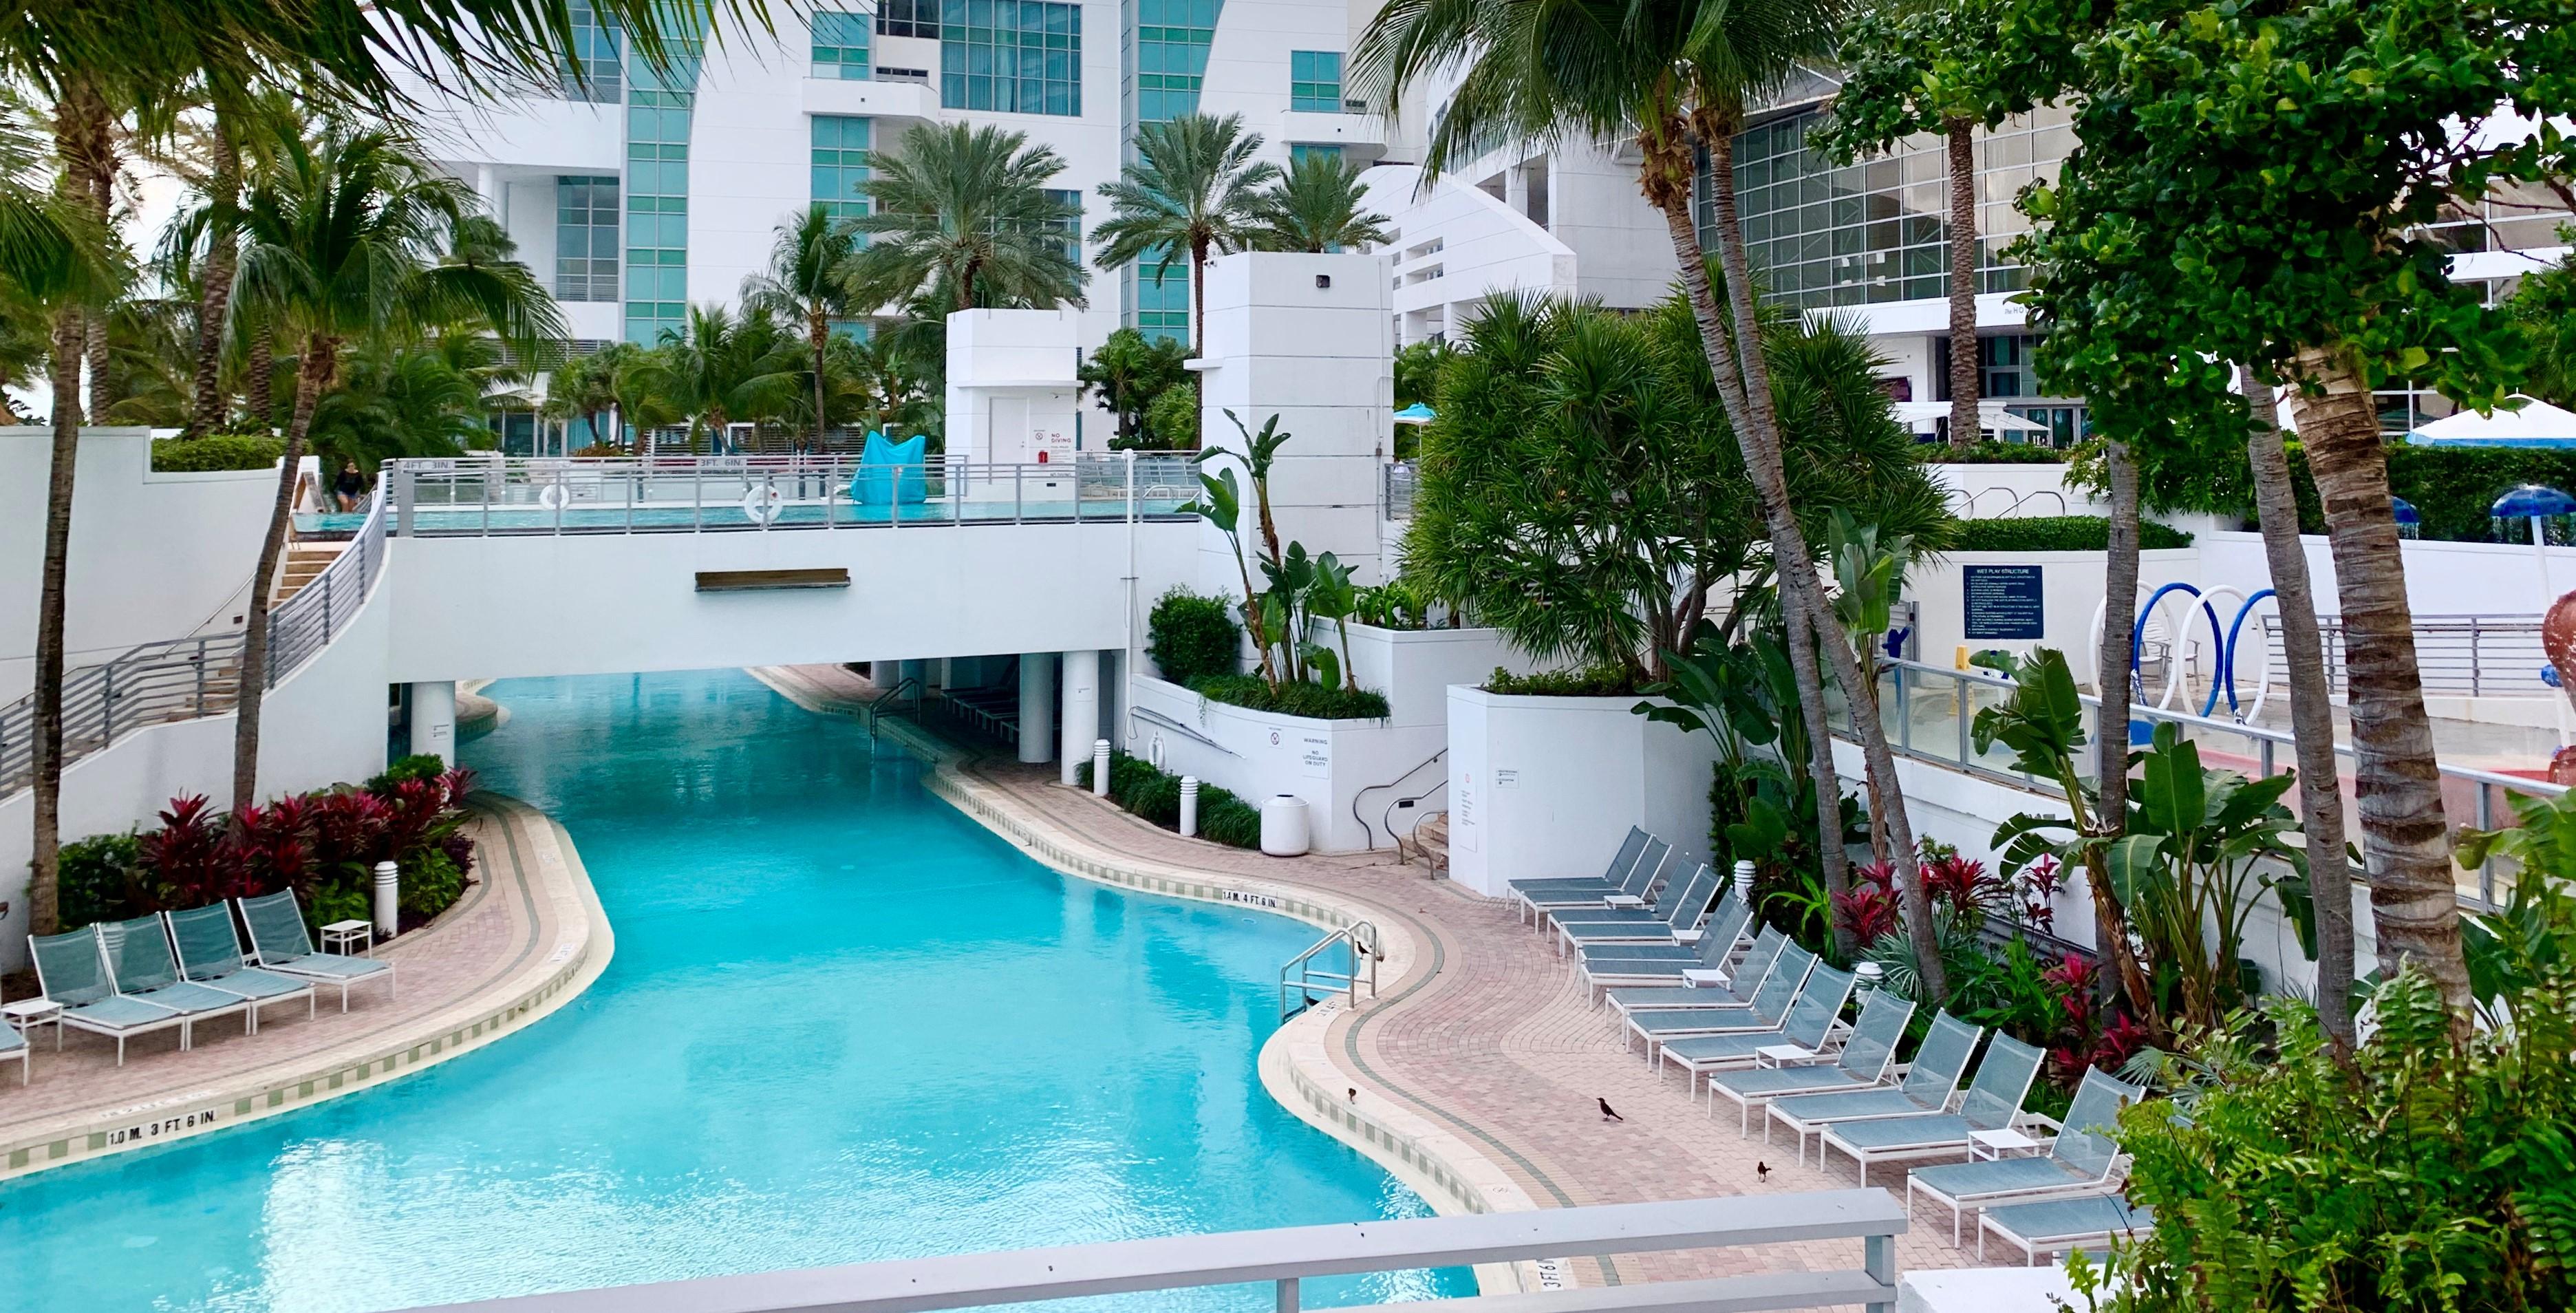 Washington, DC Condos With Swimming Pool